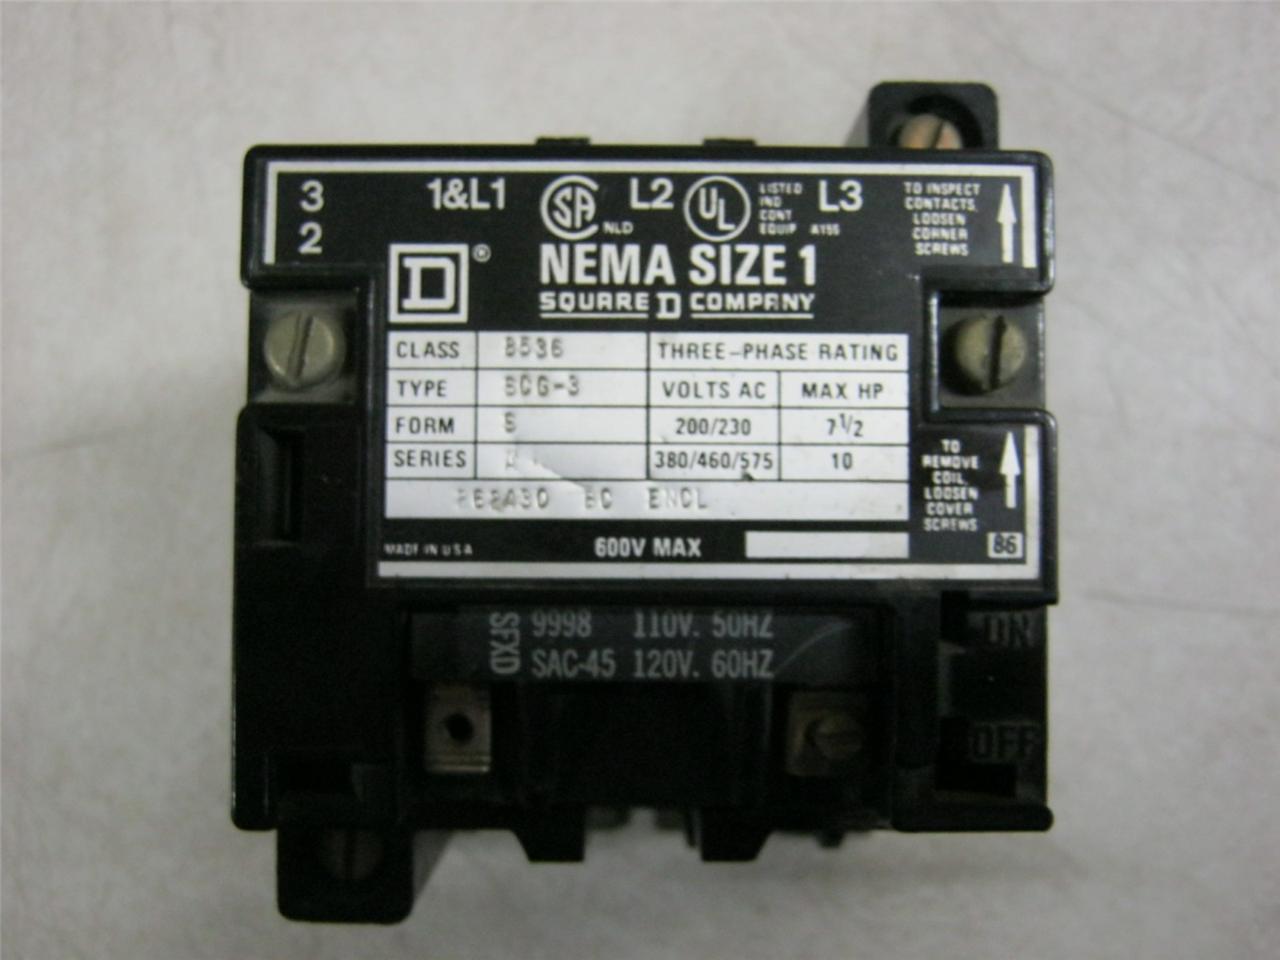 square d 8536 motor starter wiring diagram 2004 dodge neon srt 4 radio 8536scg3 600v industrial size 1